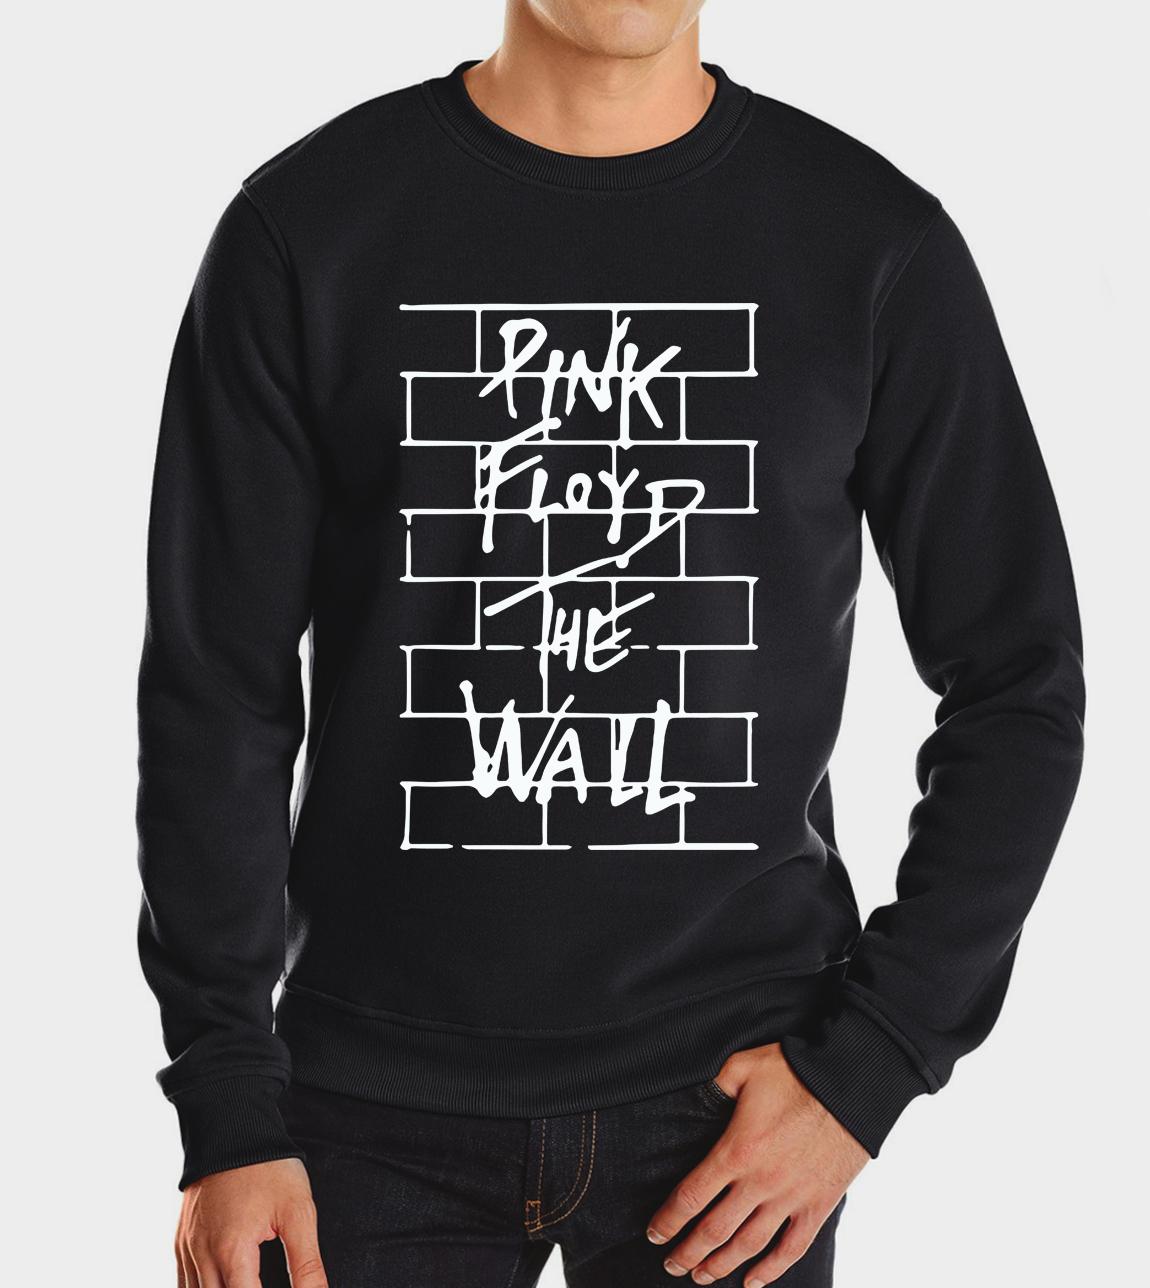 2016 autumn winter new pink floyd the wall hoodies harajuku brand fleece american football sweatshirt gym hip hop men harajuku(China (Mainland))